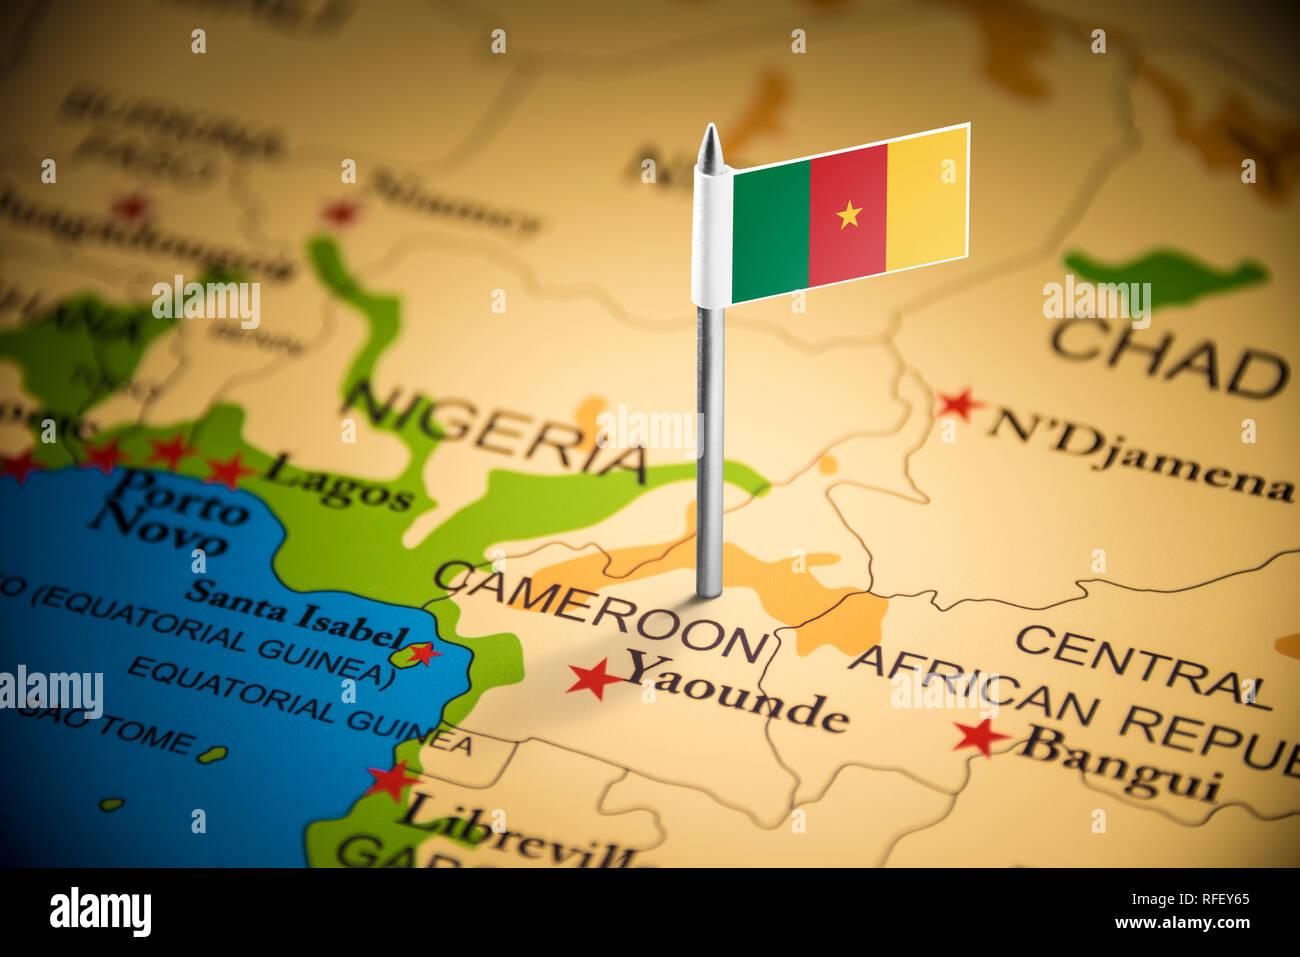 Cameroon marked with a flag on the map Stock Photo ... on côte d'ivoire map, estonia map, grenada map, monaco map, gambia map, saudi arabia map, rwanda map, madagascar map, ghana map, egypt map, mali map, sudan map, namibia map, croatia map, tunisia map, congo map, algeria map, thailand map, kenya map, angola map, liberia map, cape verde map, morocco map, gabon map, uganda map, africa map, libya map, nigeria map, senegal map, malawi map, ecuador map, comoros map, niger map, ethiopia map, mozambique map, zimbabwe map,